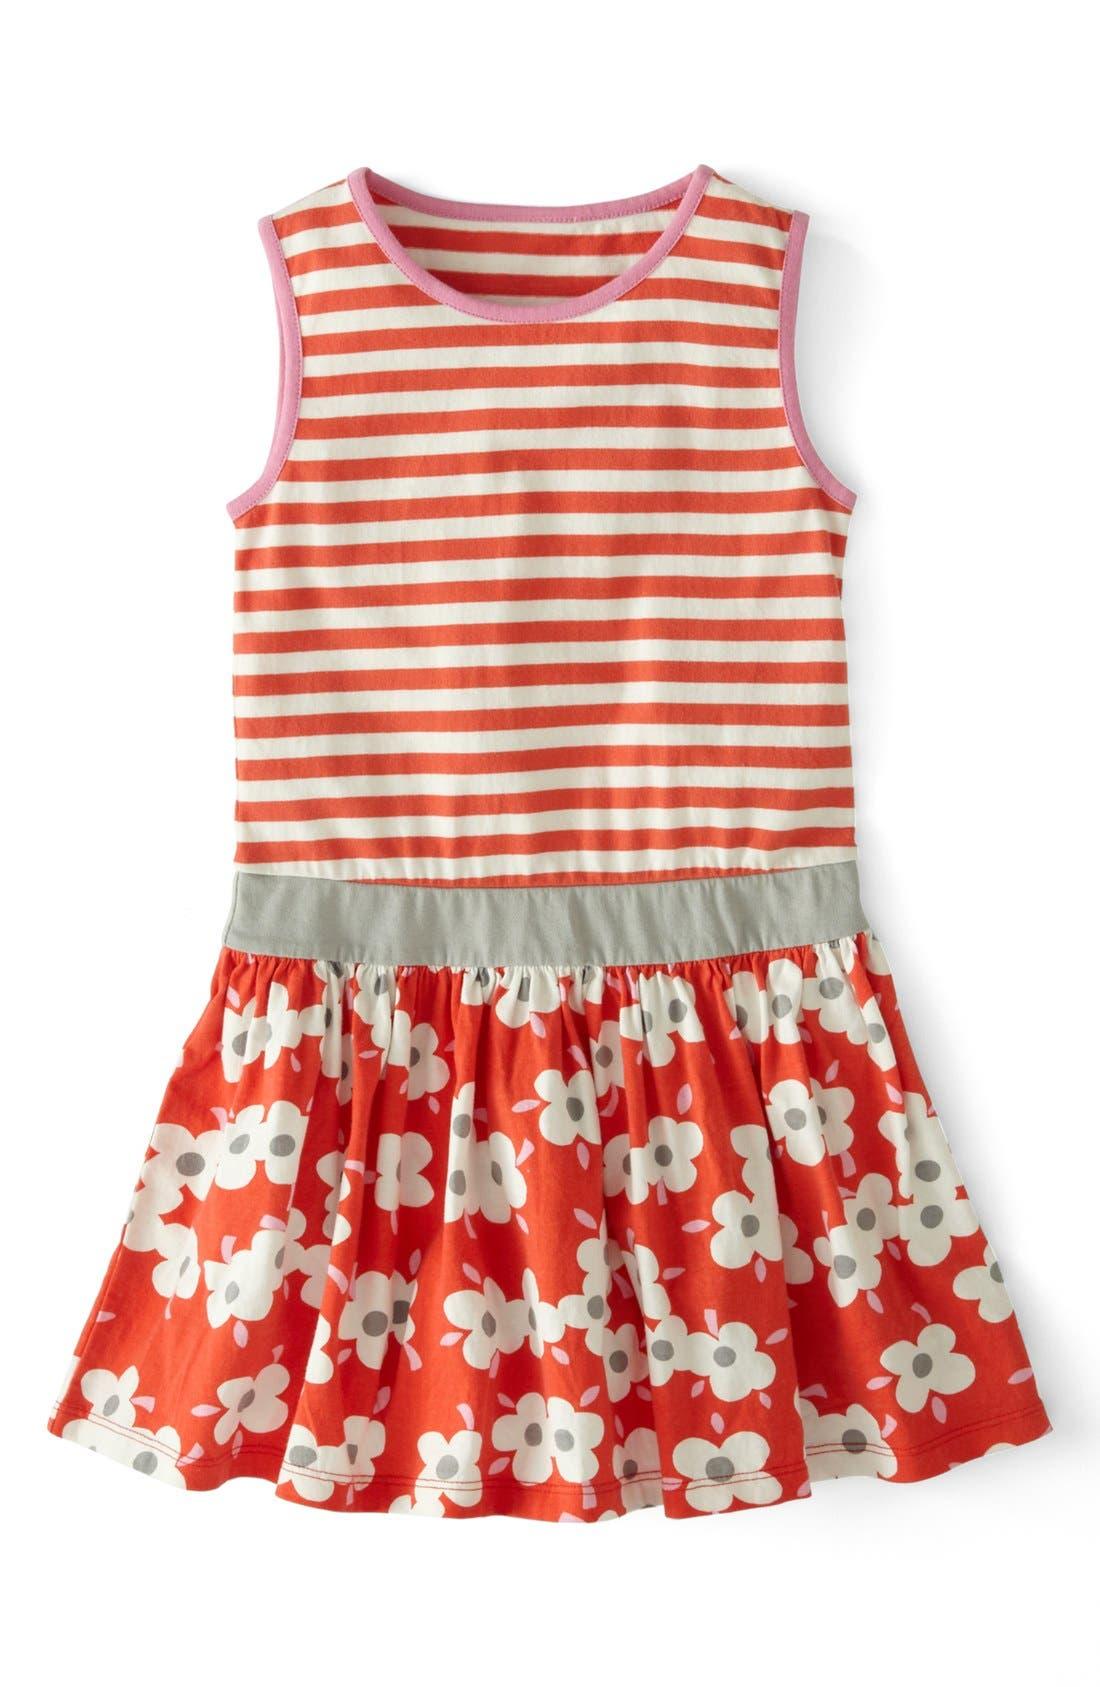 Main Image - Mini Boden 'Jolly' Cotton Jersey Dress (Toddler Girls)